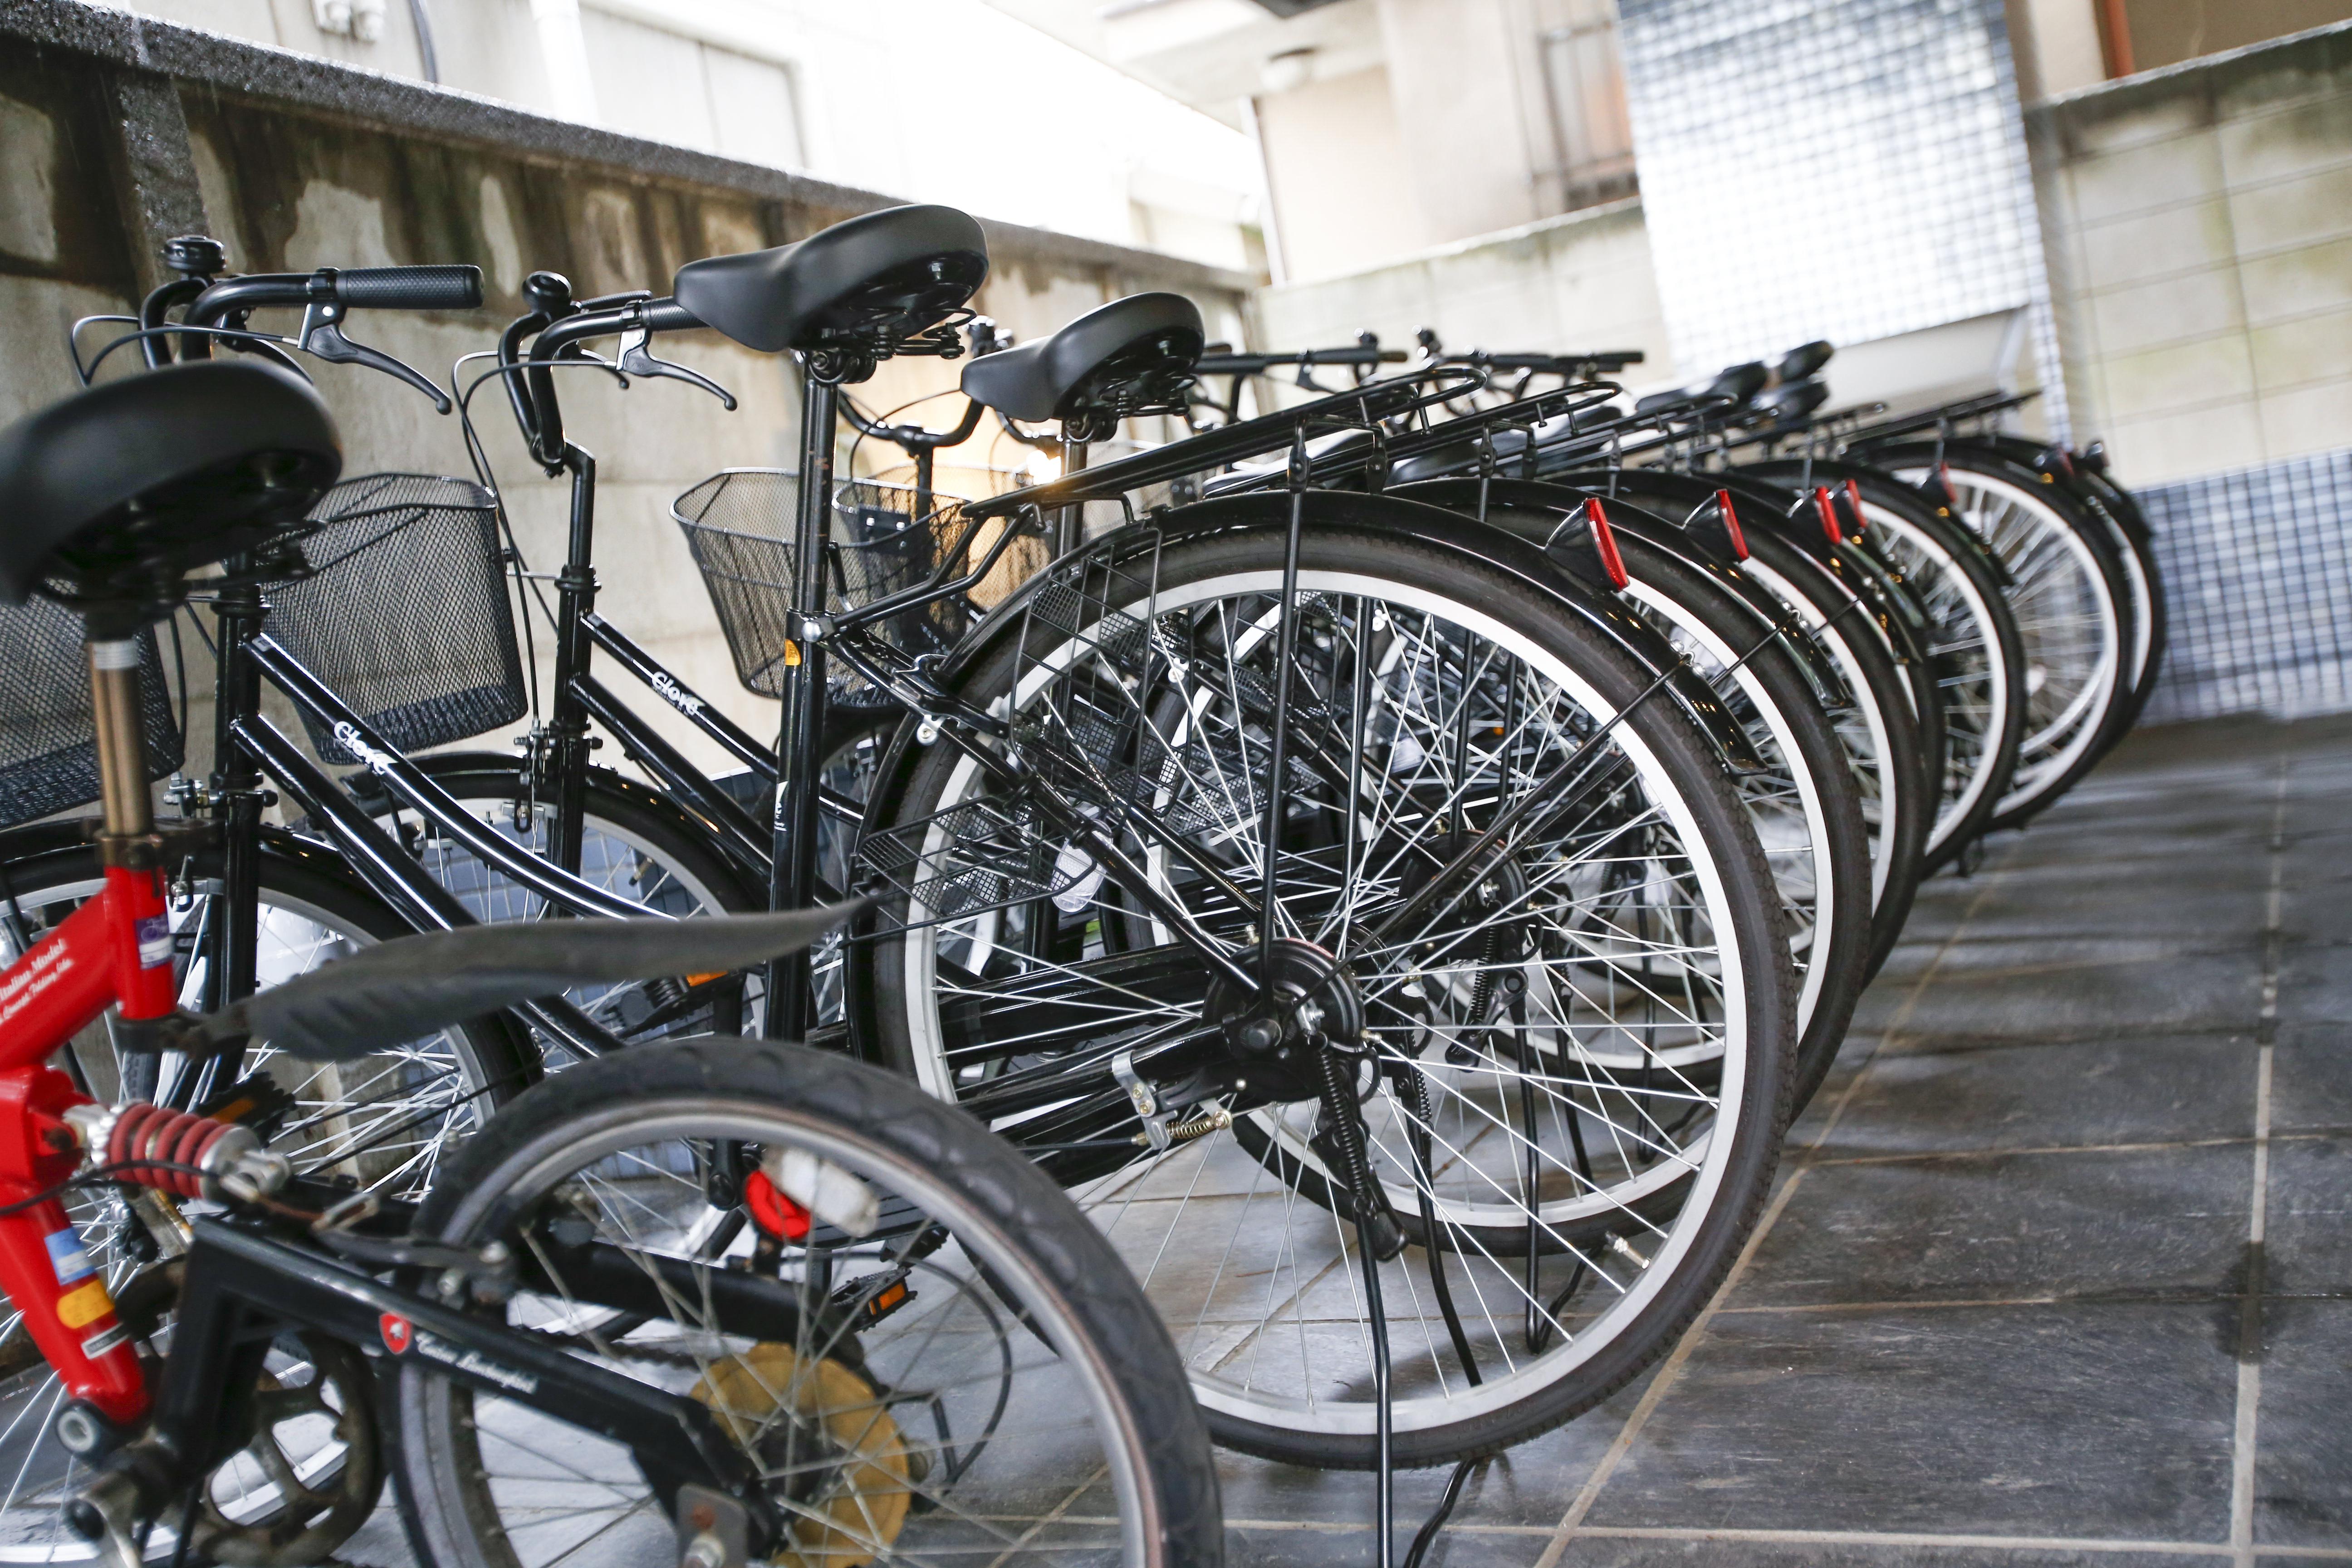 Tokyo Serviced Apartment bike rental